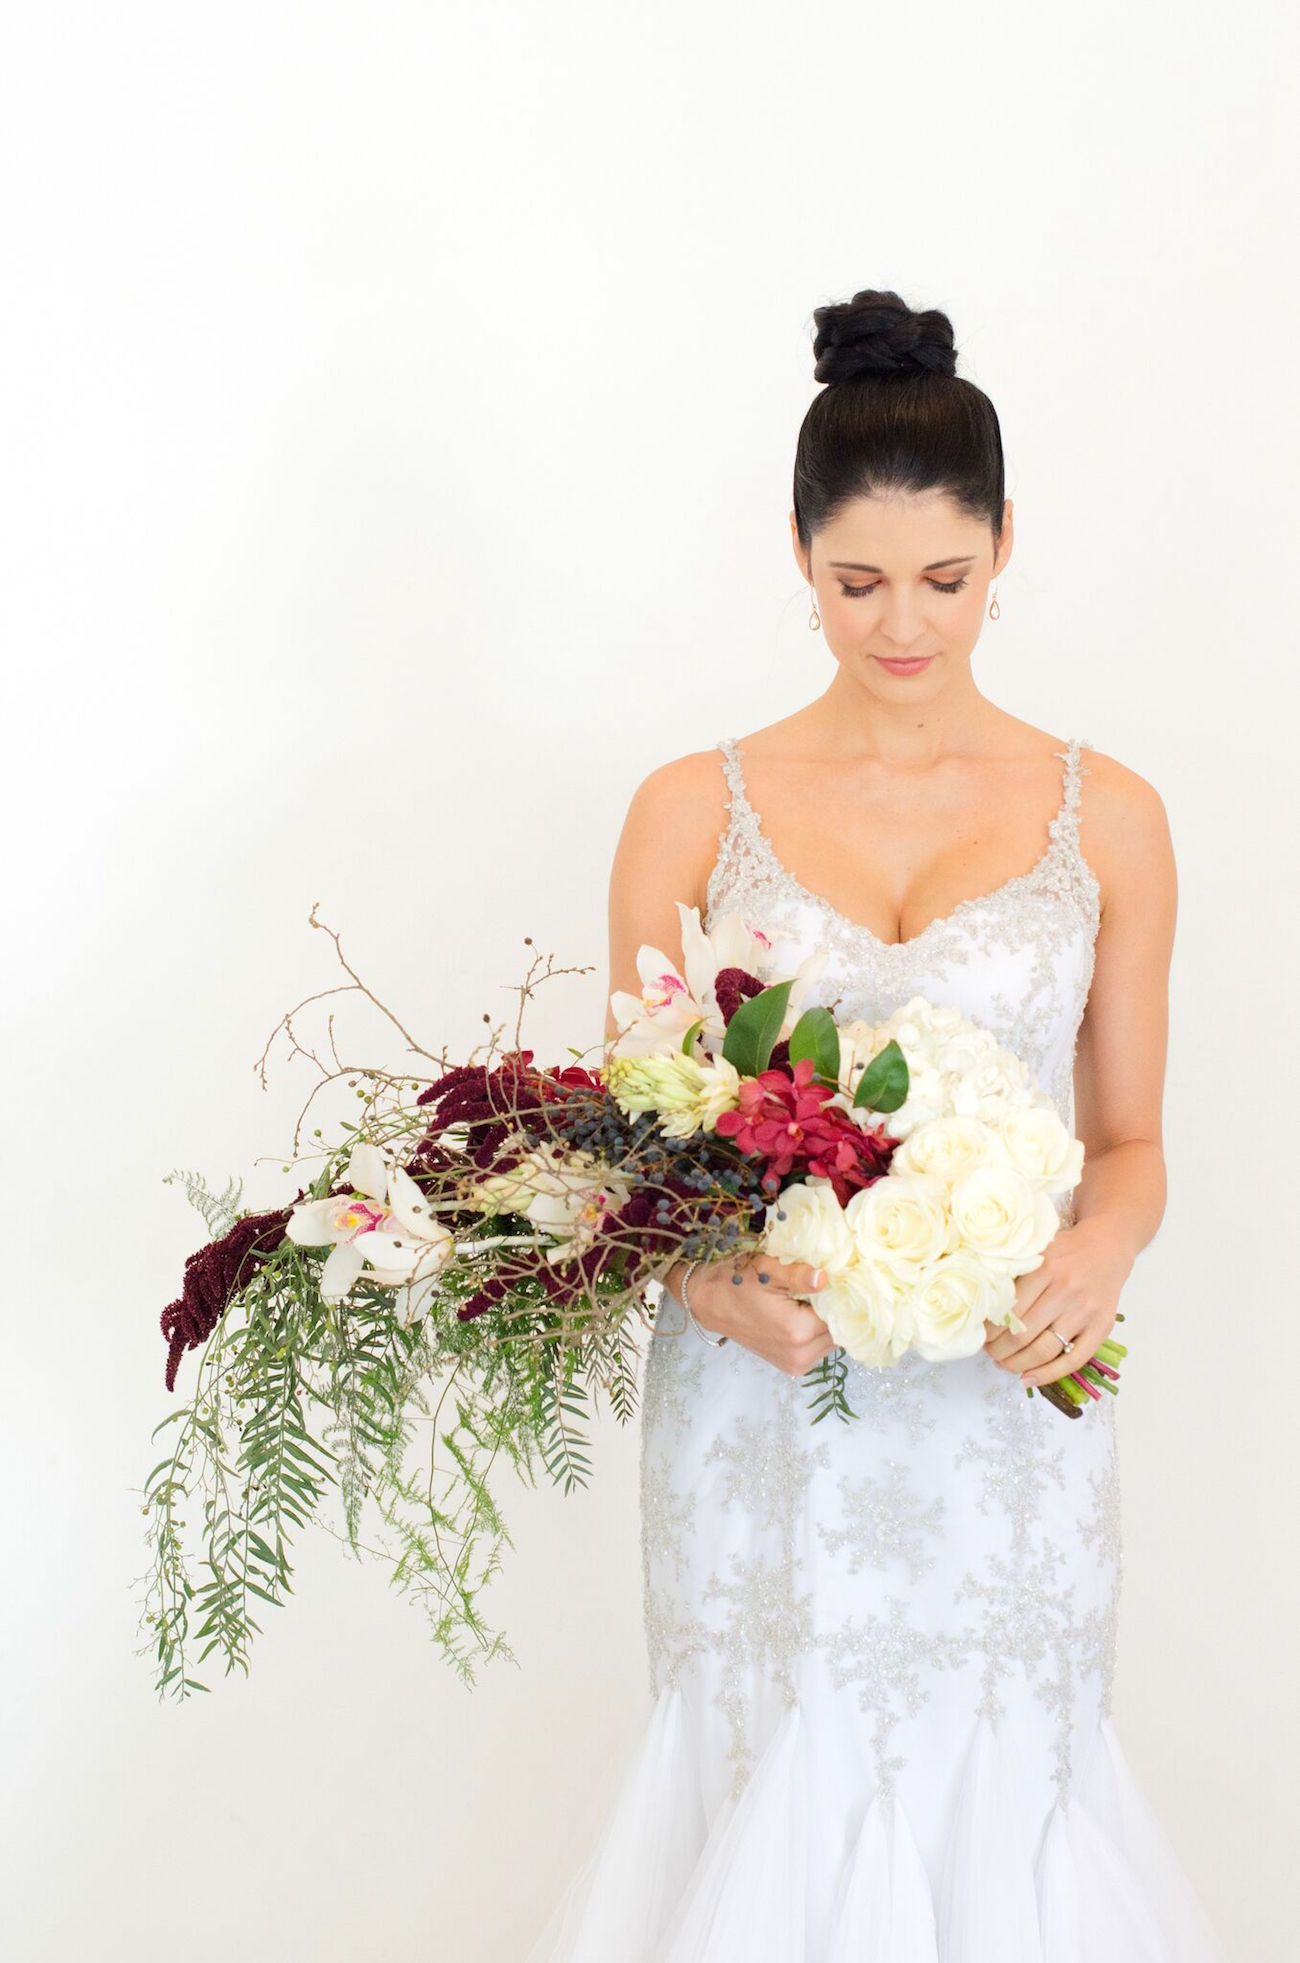 007-emerald-copper-burgundy-christmas-wedding-inspiration